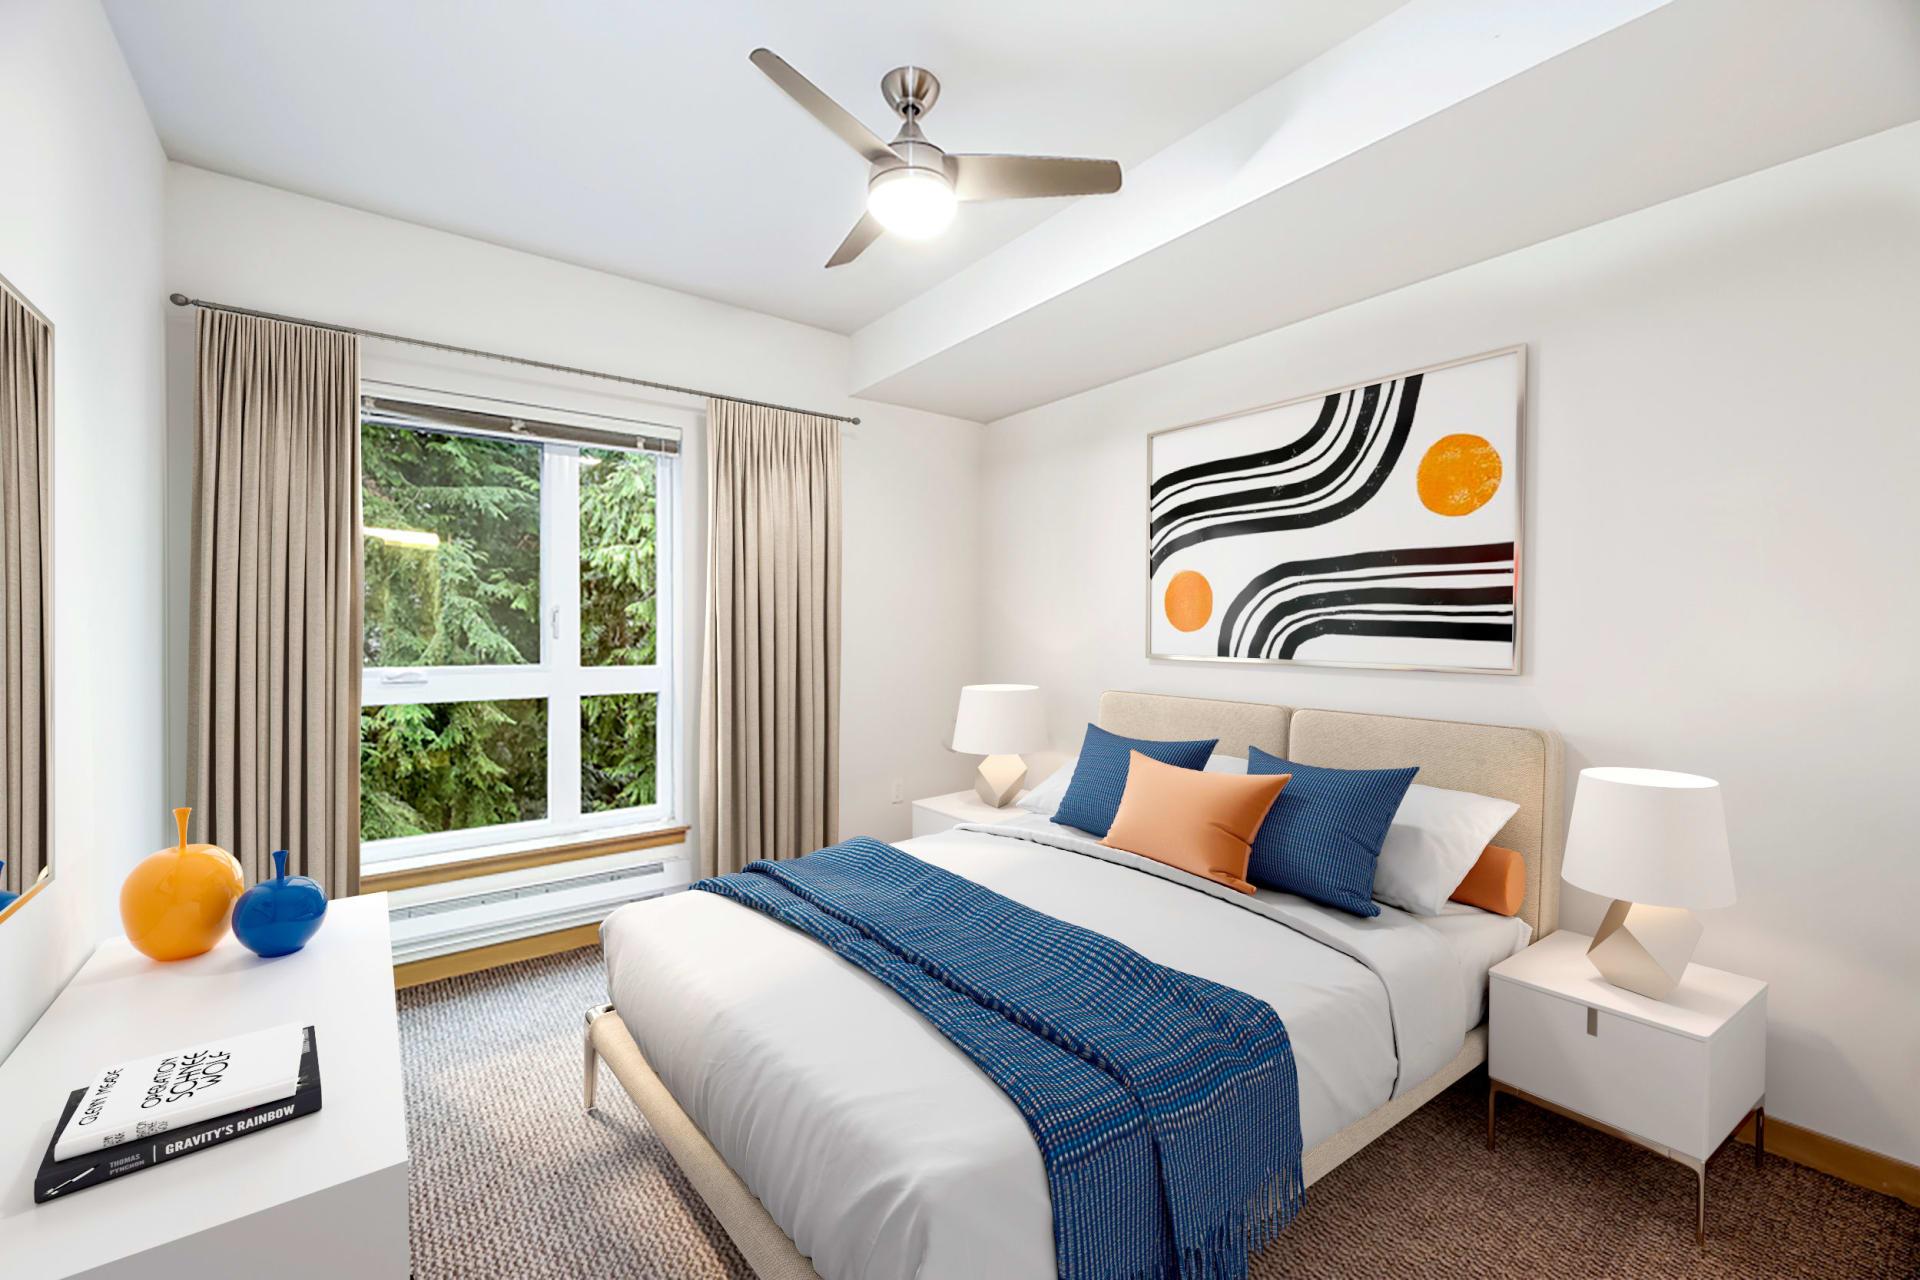 Model bedroom at Trillium Apartments in Edmonds, Washington